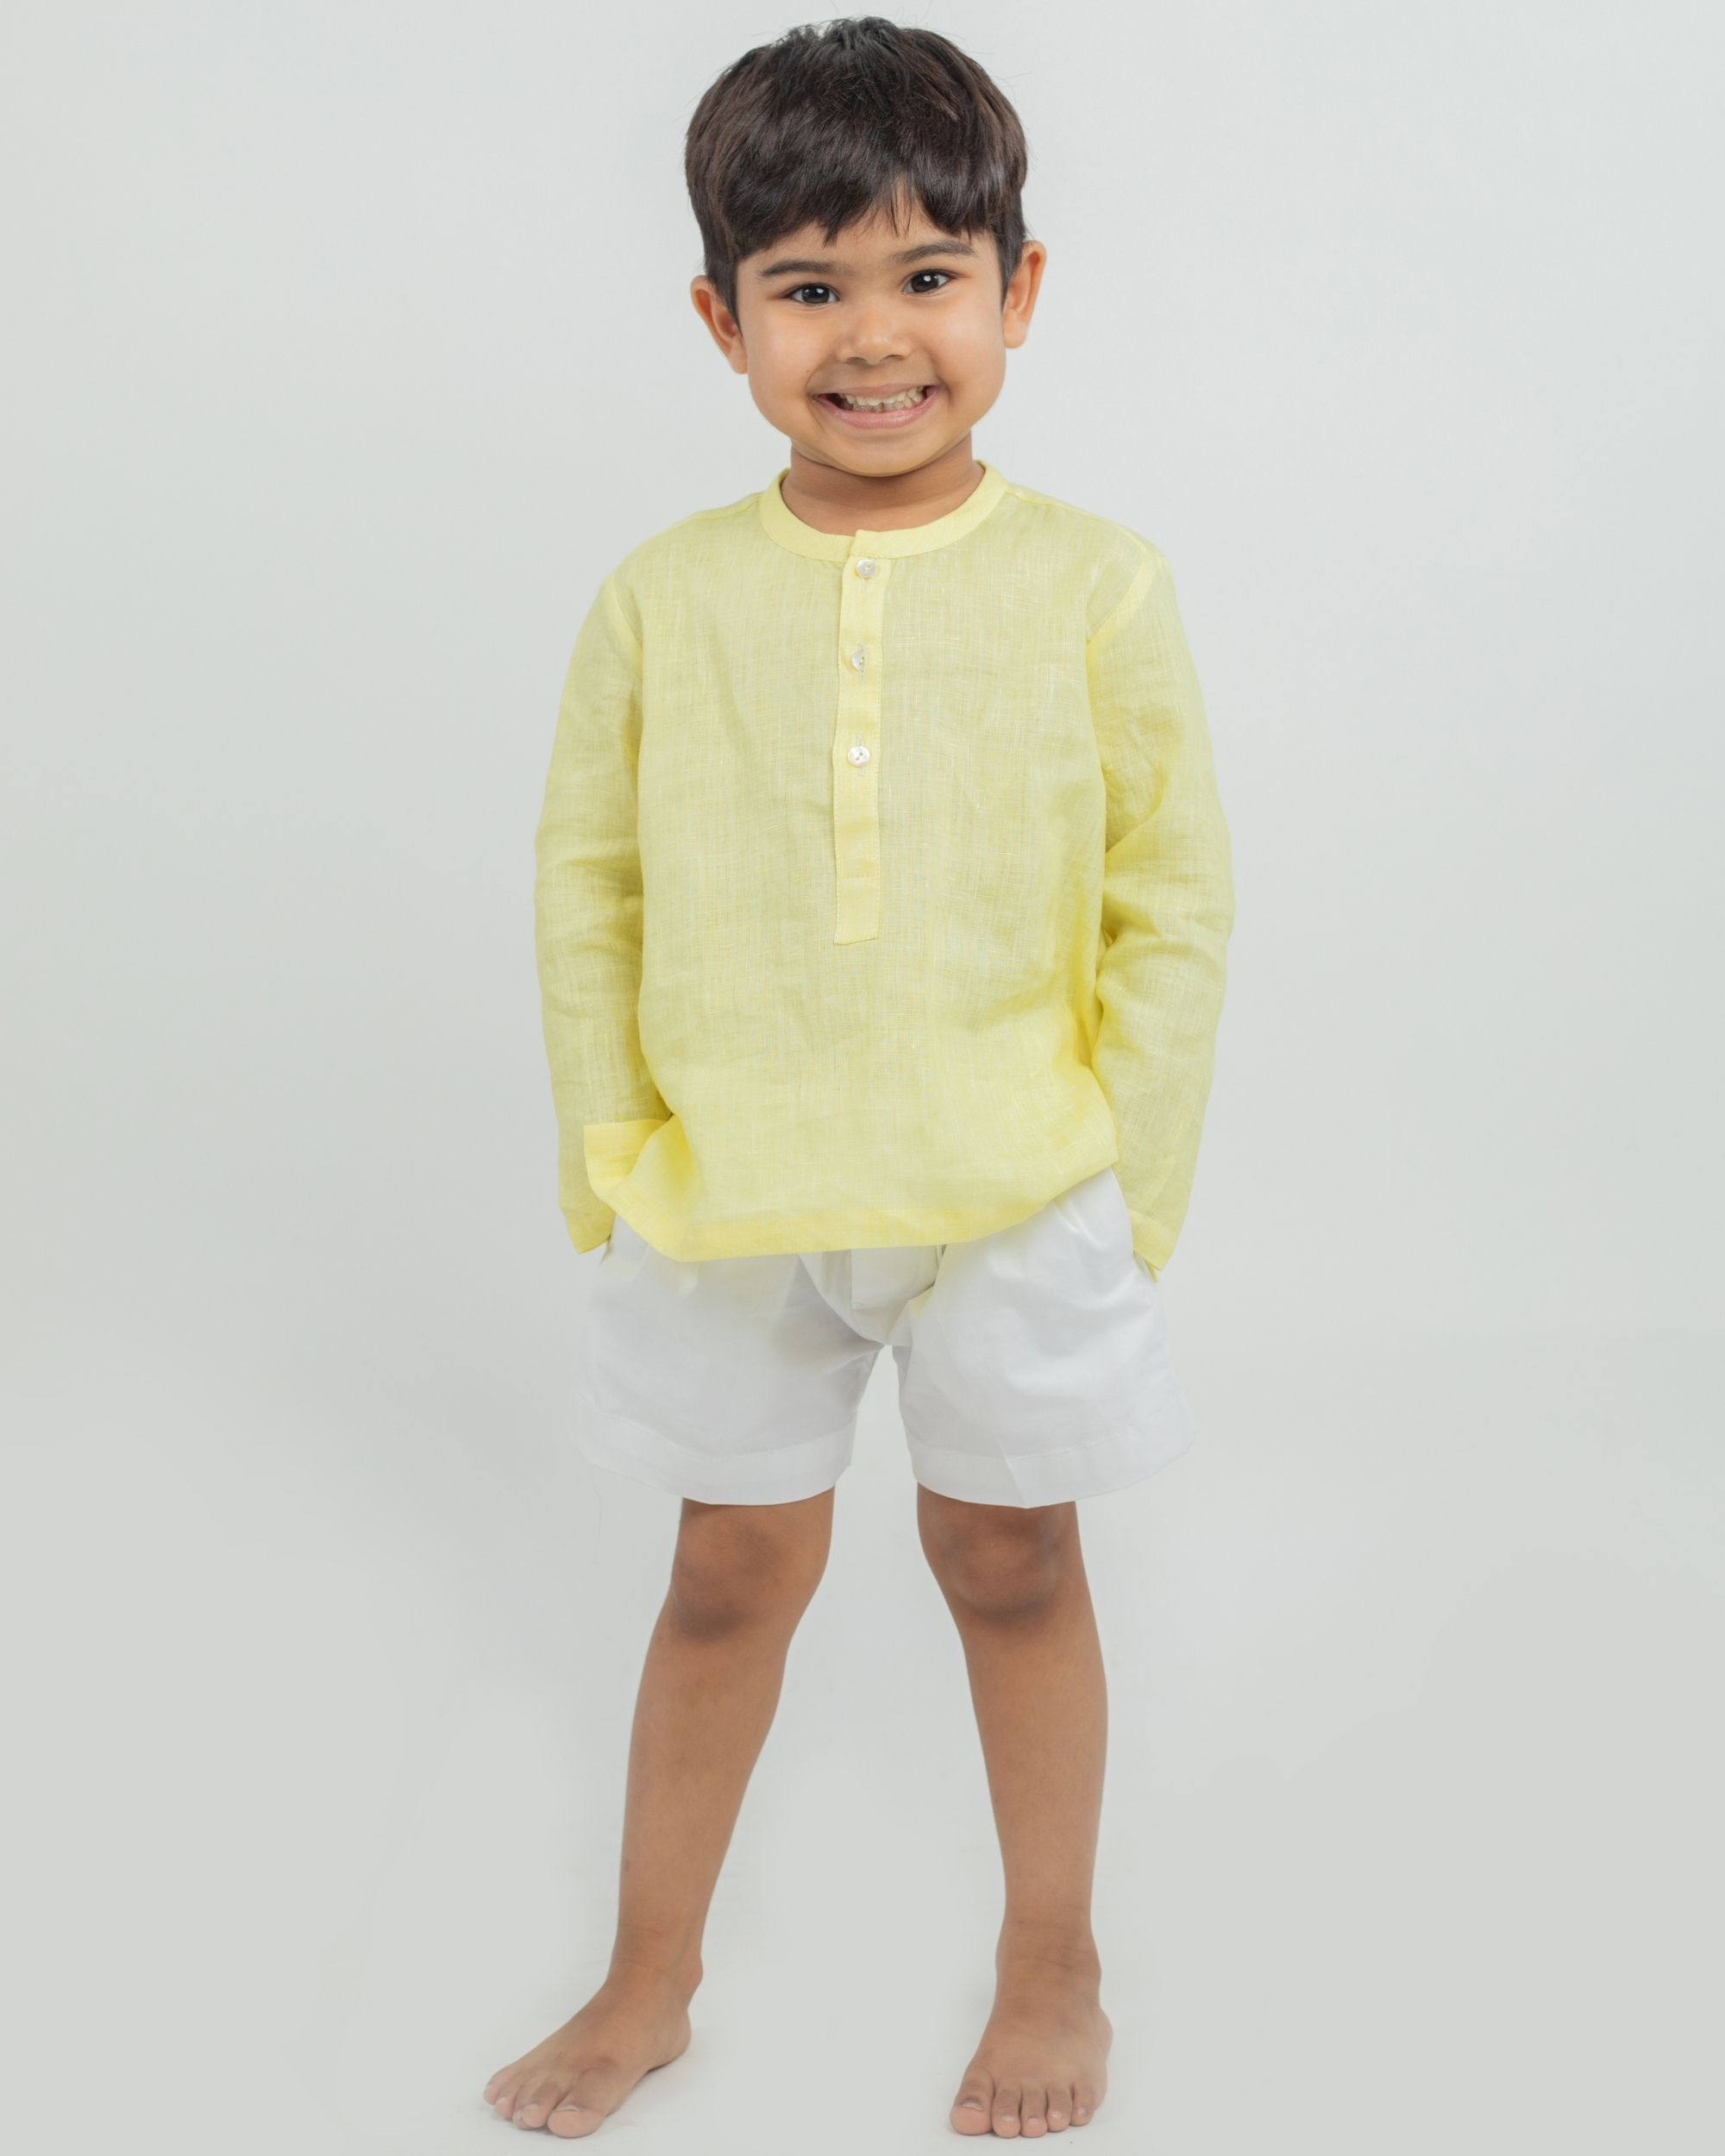 Yellow linen kurta and white shorts - set of two